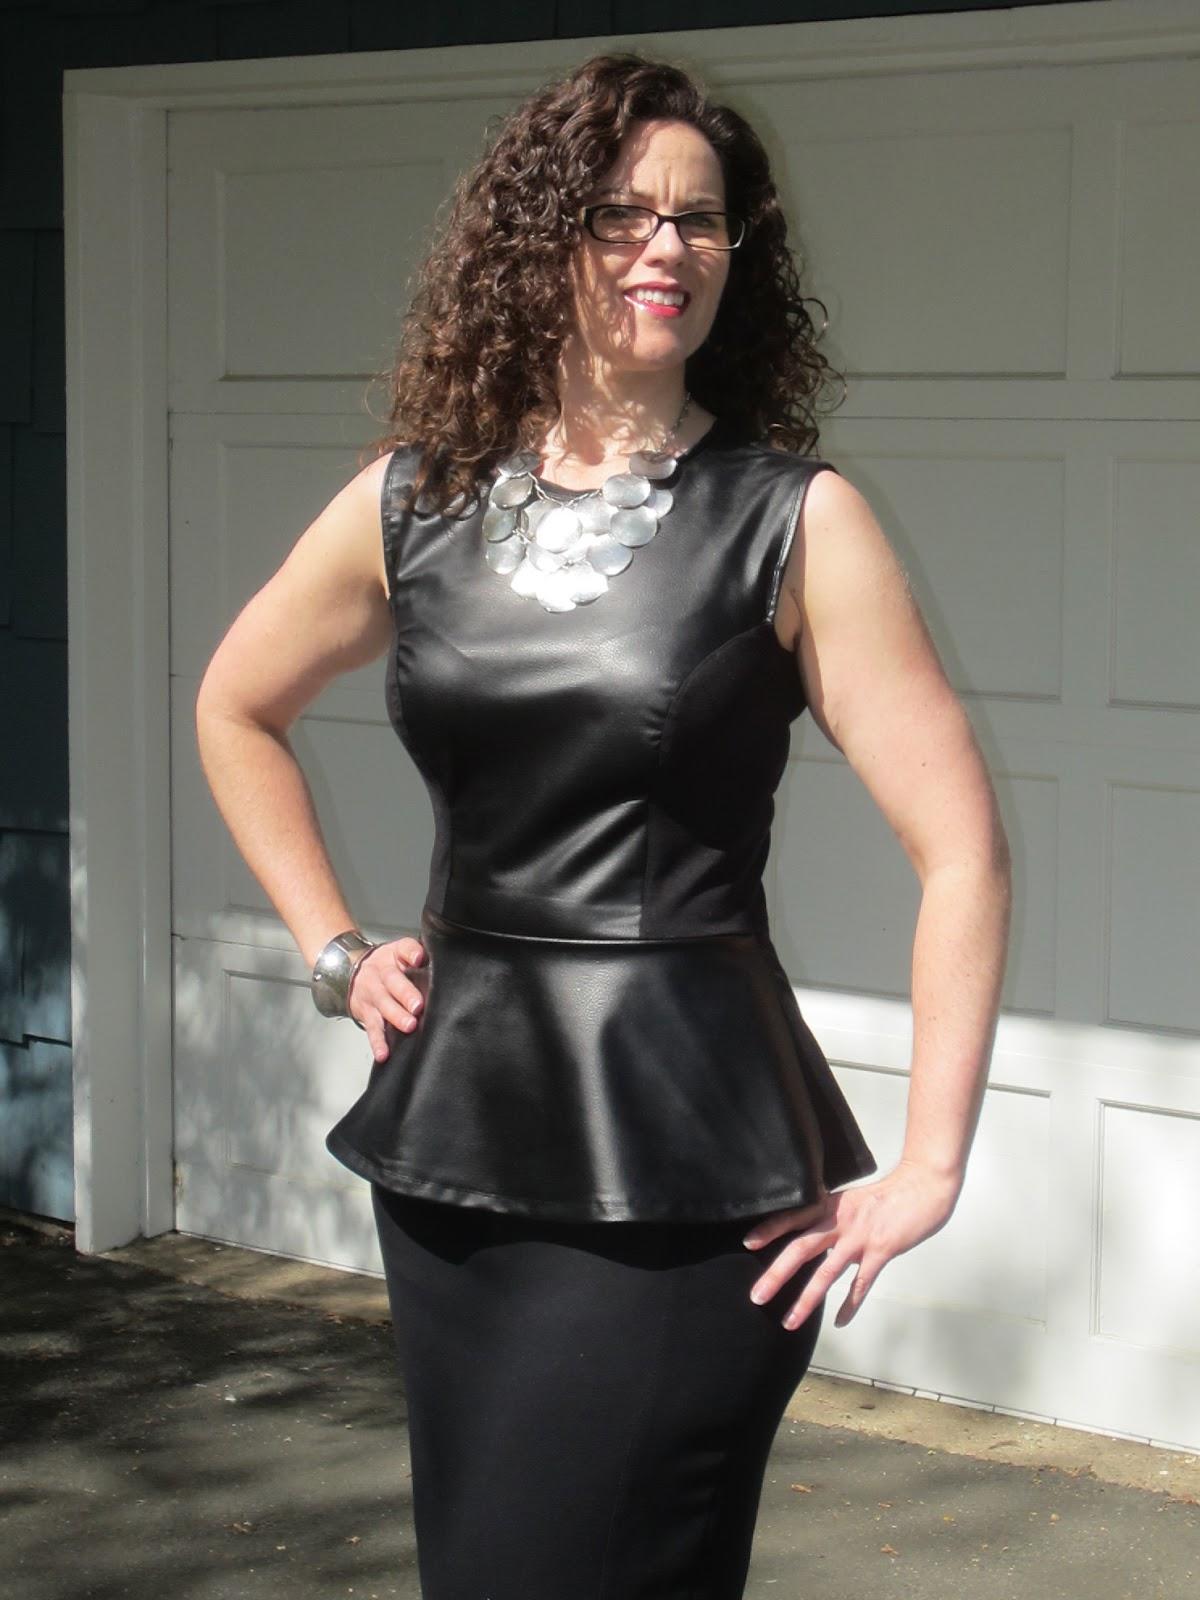 lether-skirt-fetish-small